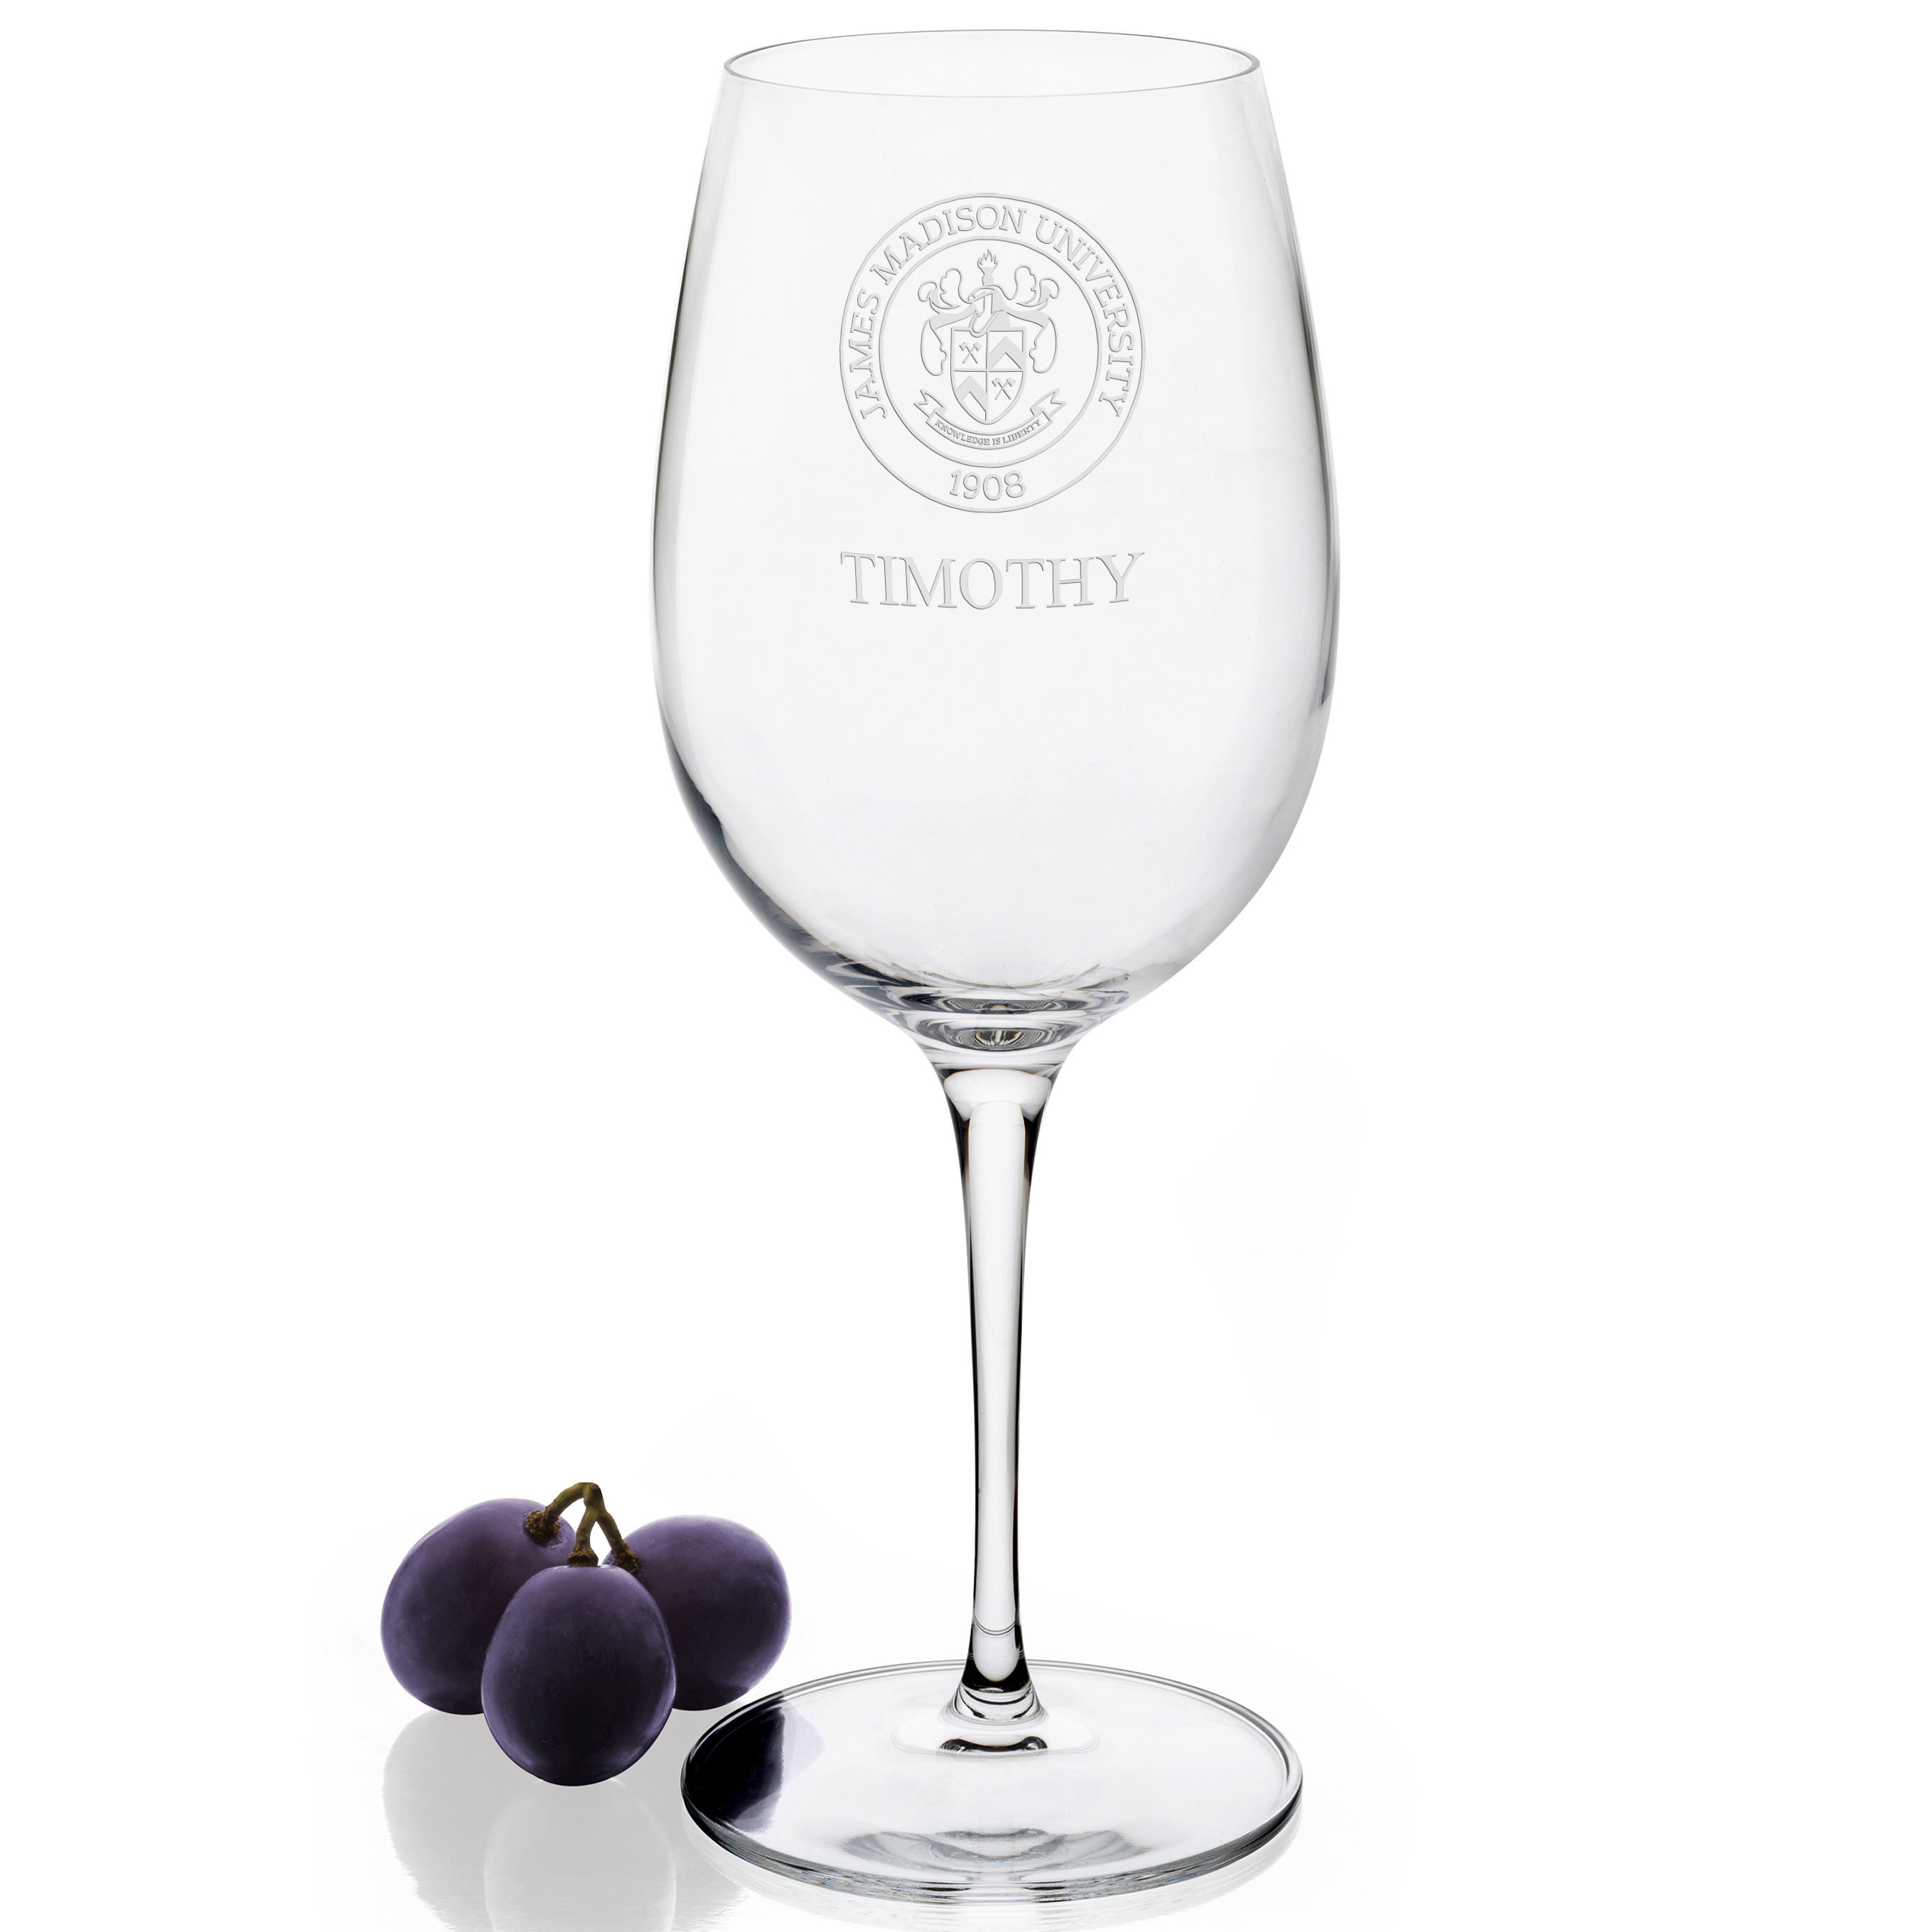 James Madison University Red Wine Glasses - Set of 4 - Image 2